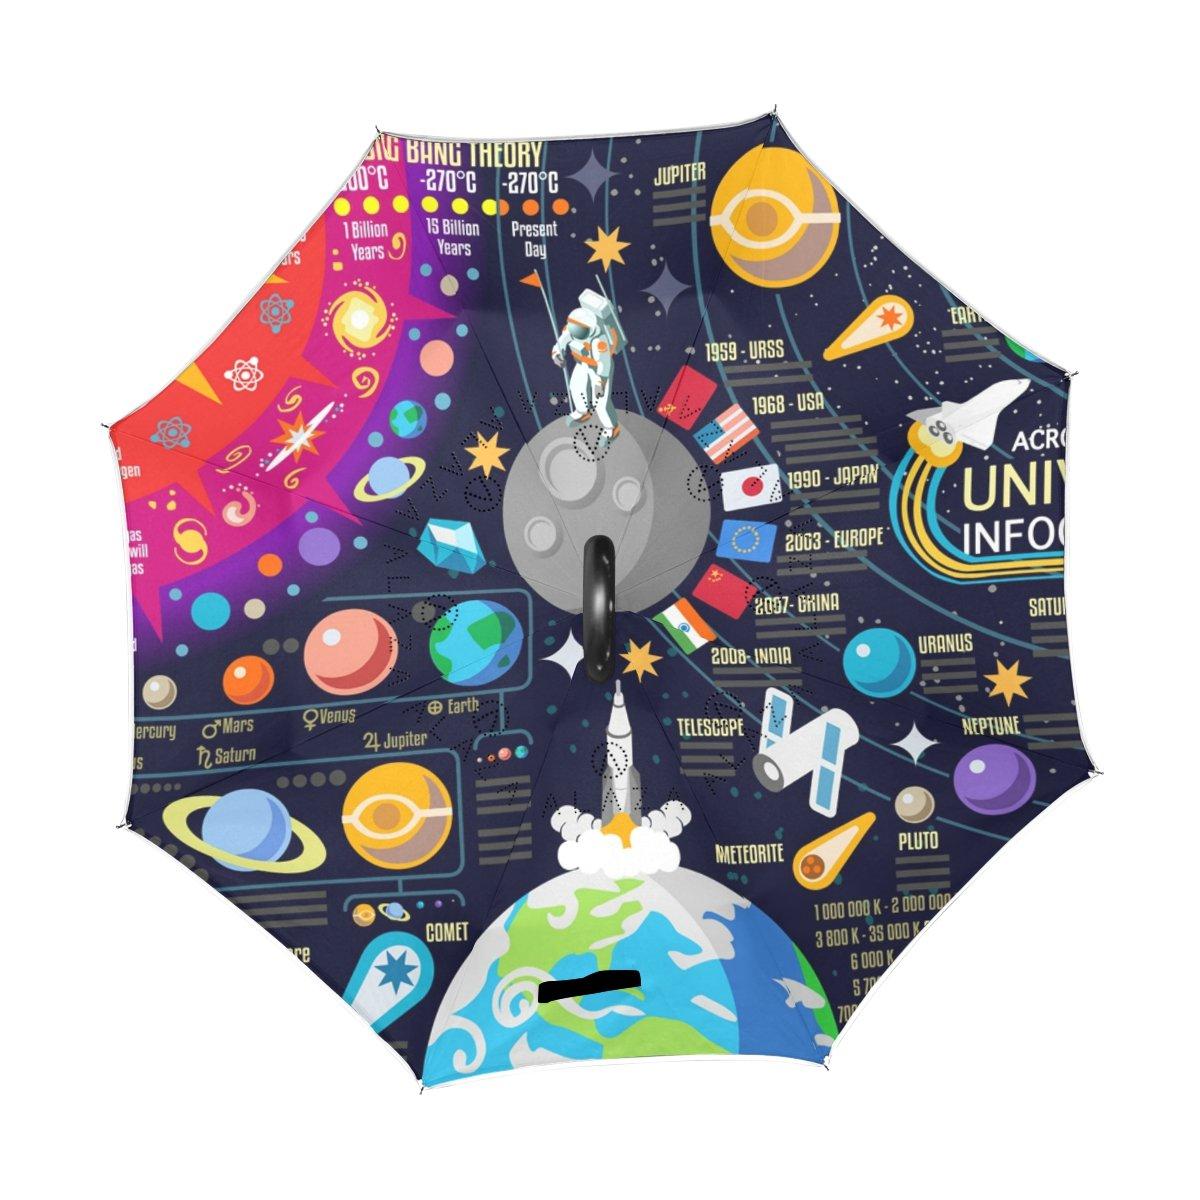 Alaza U Life Universe Space Big Bang Theory Sun Earth Planets Reverse Inverted Umbrellasリバーシブル太陽雨傘車屋外の使用C型のハンドル   B07DFXHGPP